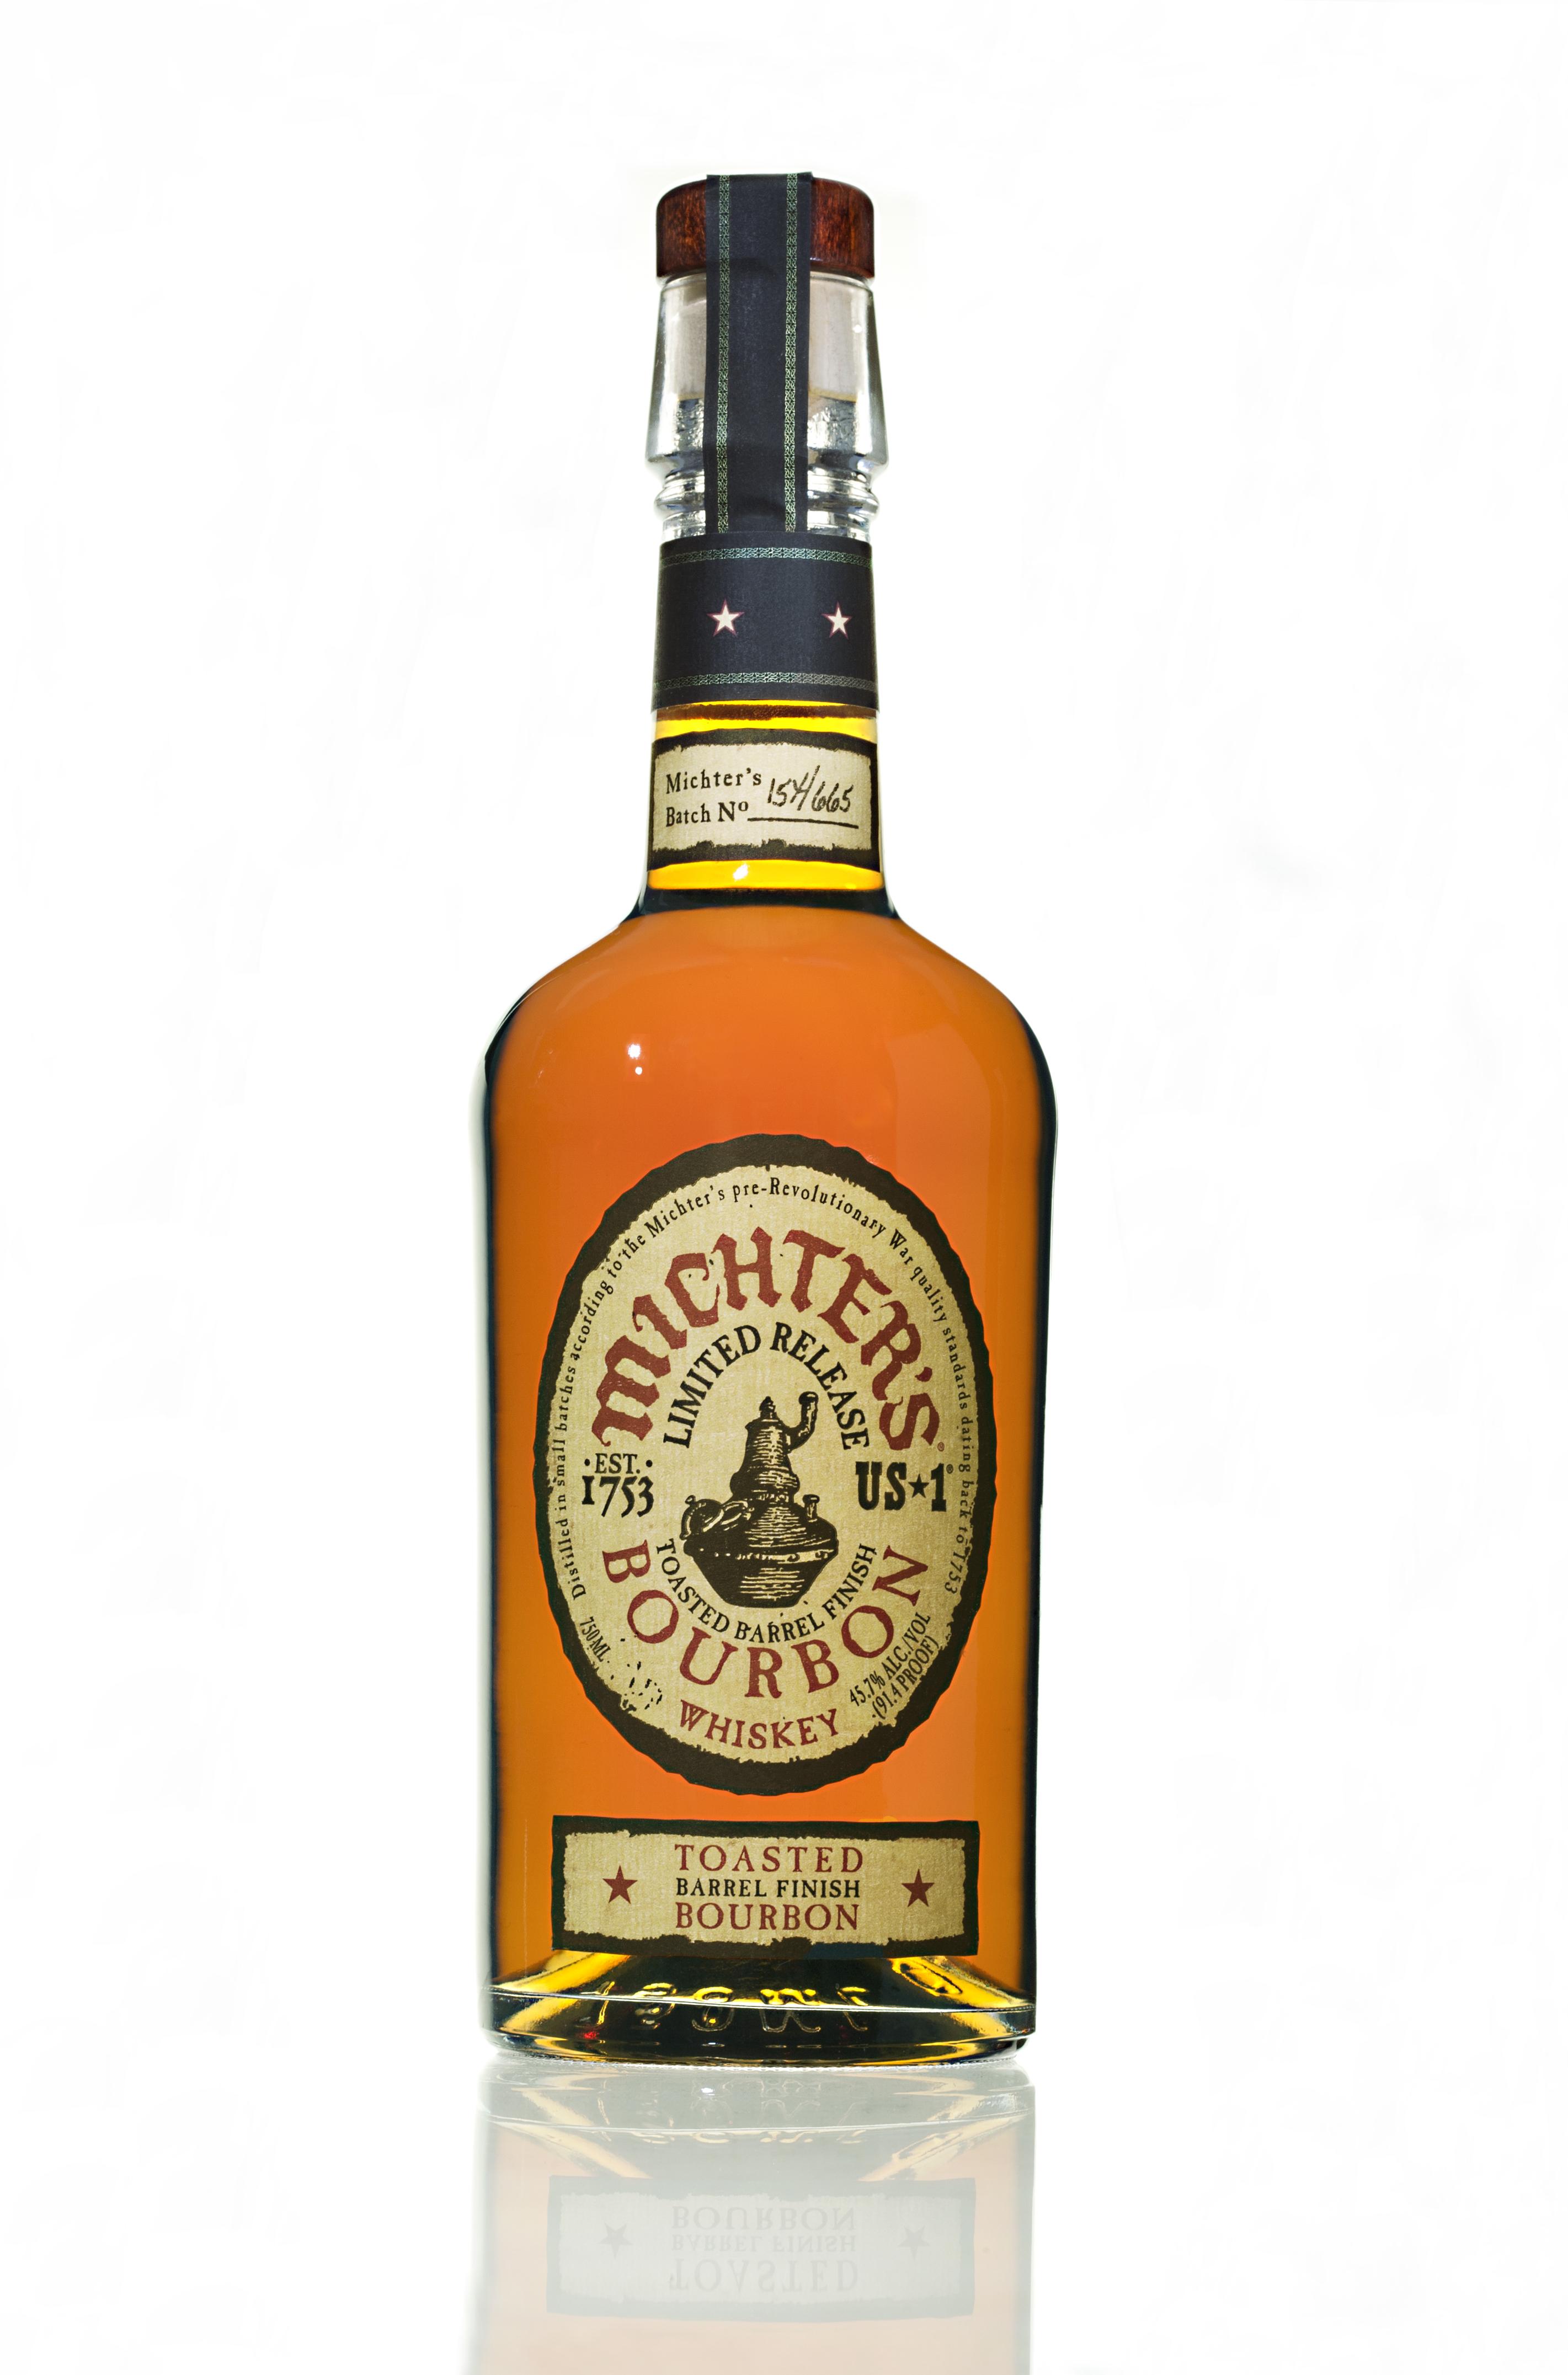 Michter's US-1 Toasted Barrel Finish Bourbon 2015